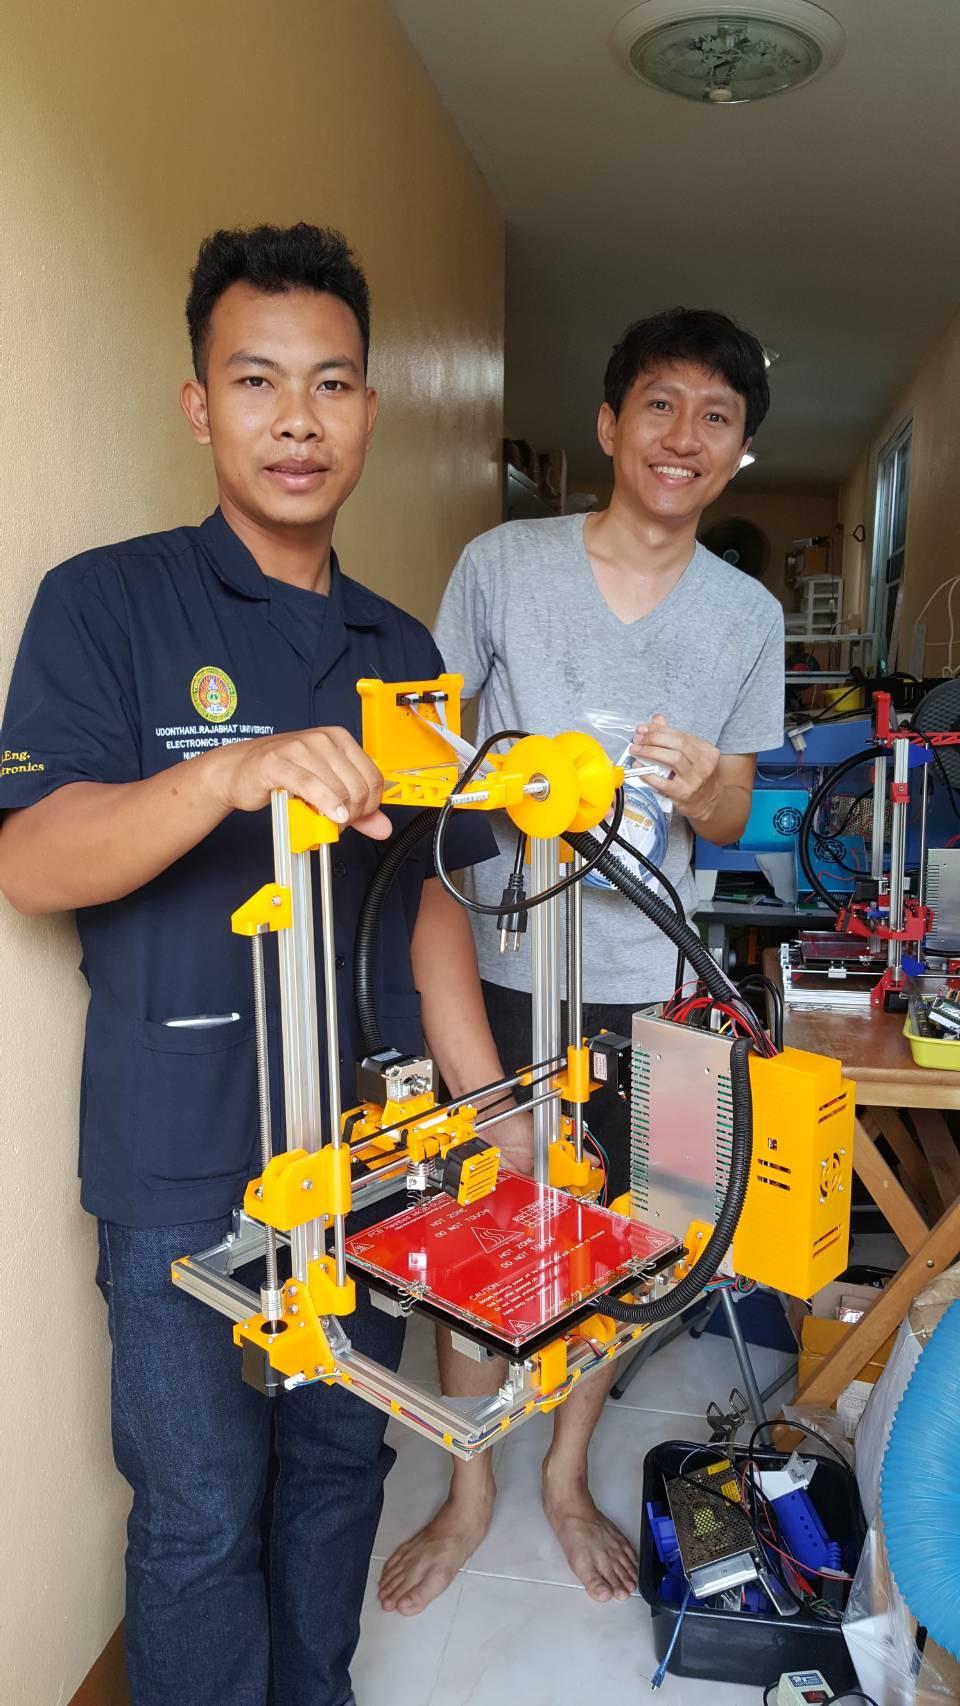 new printer 1.jpg